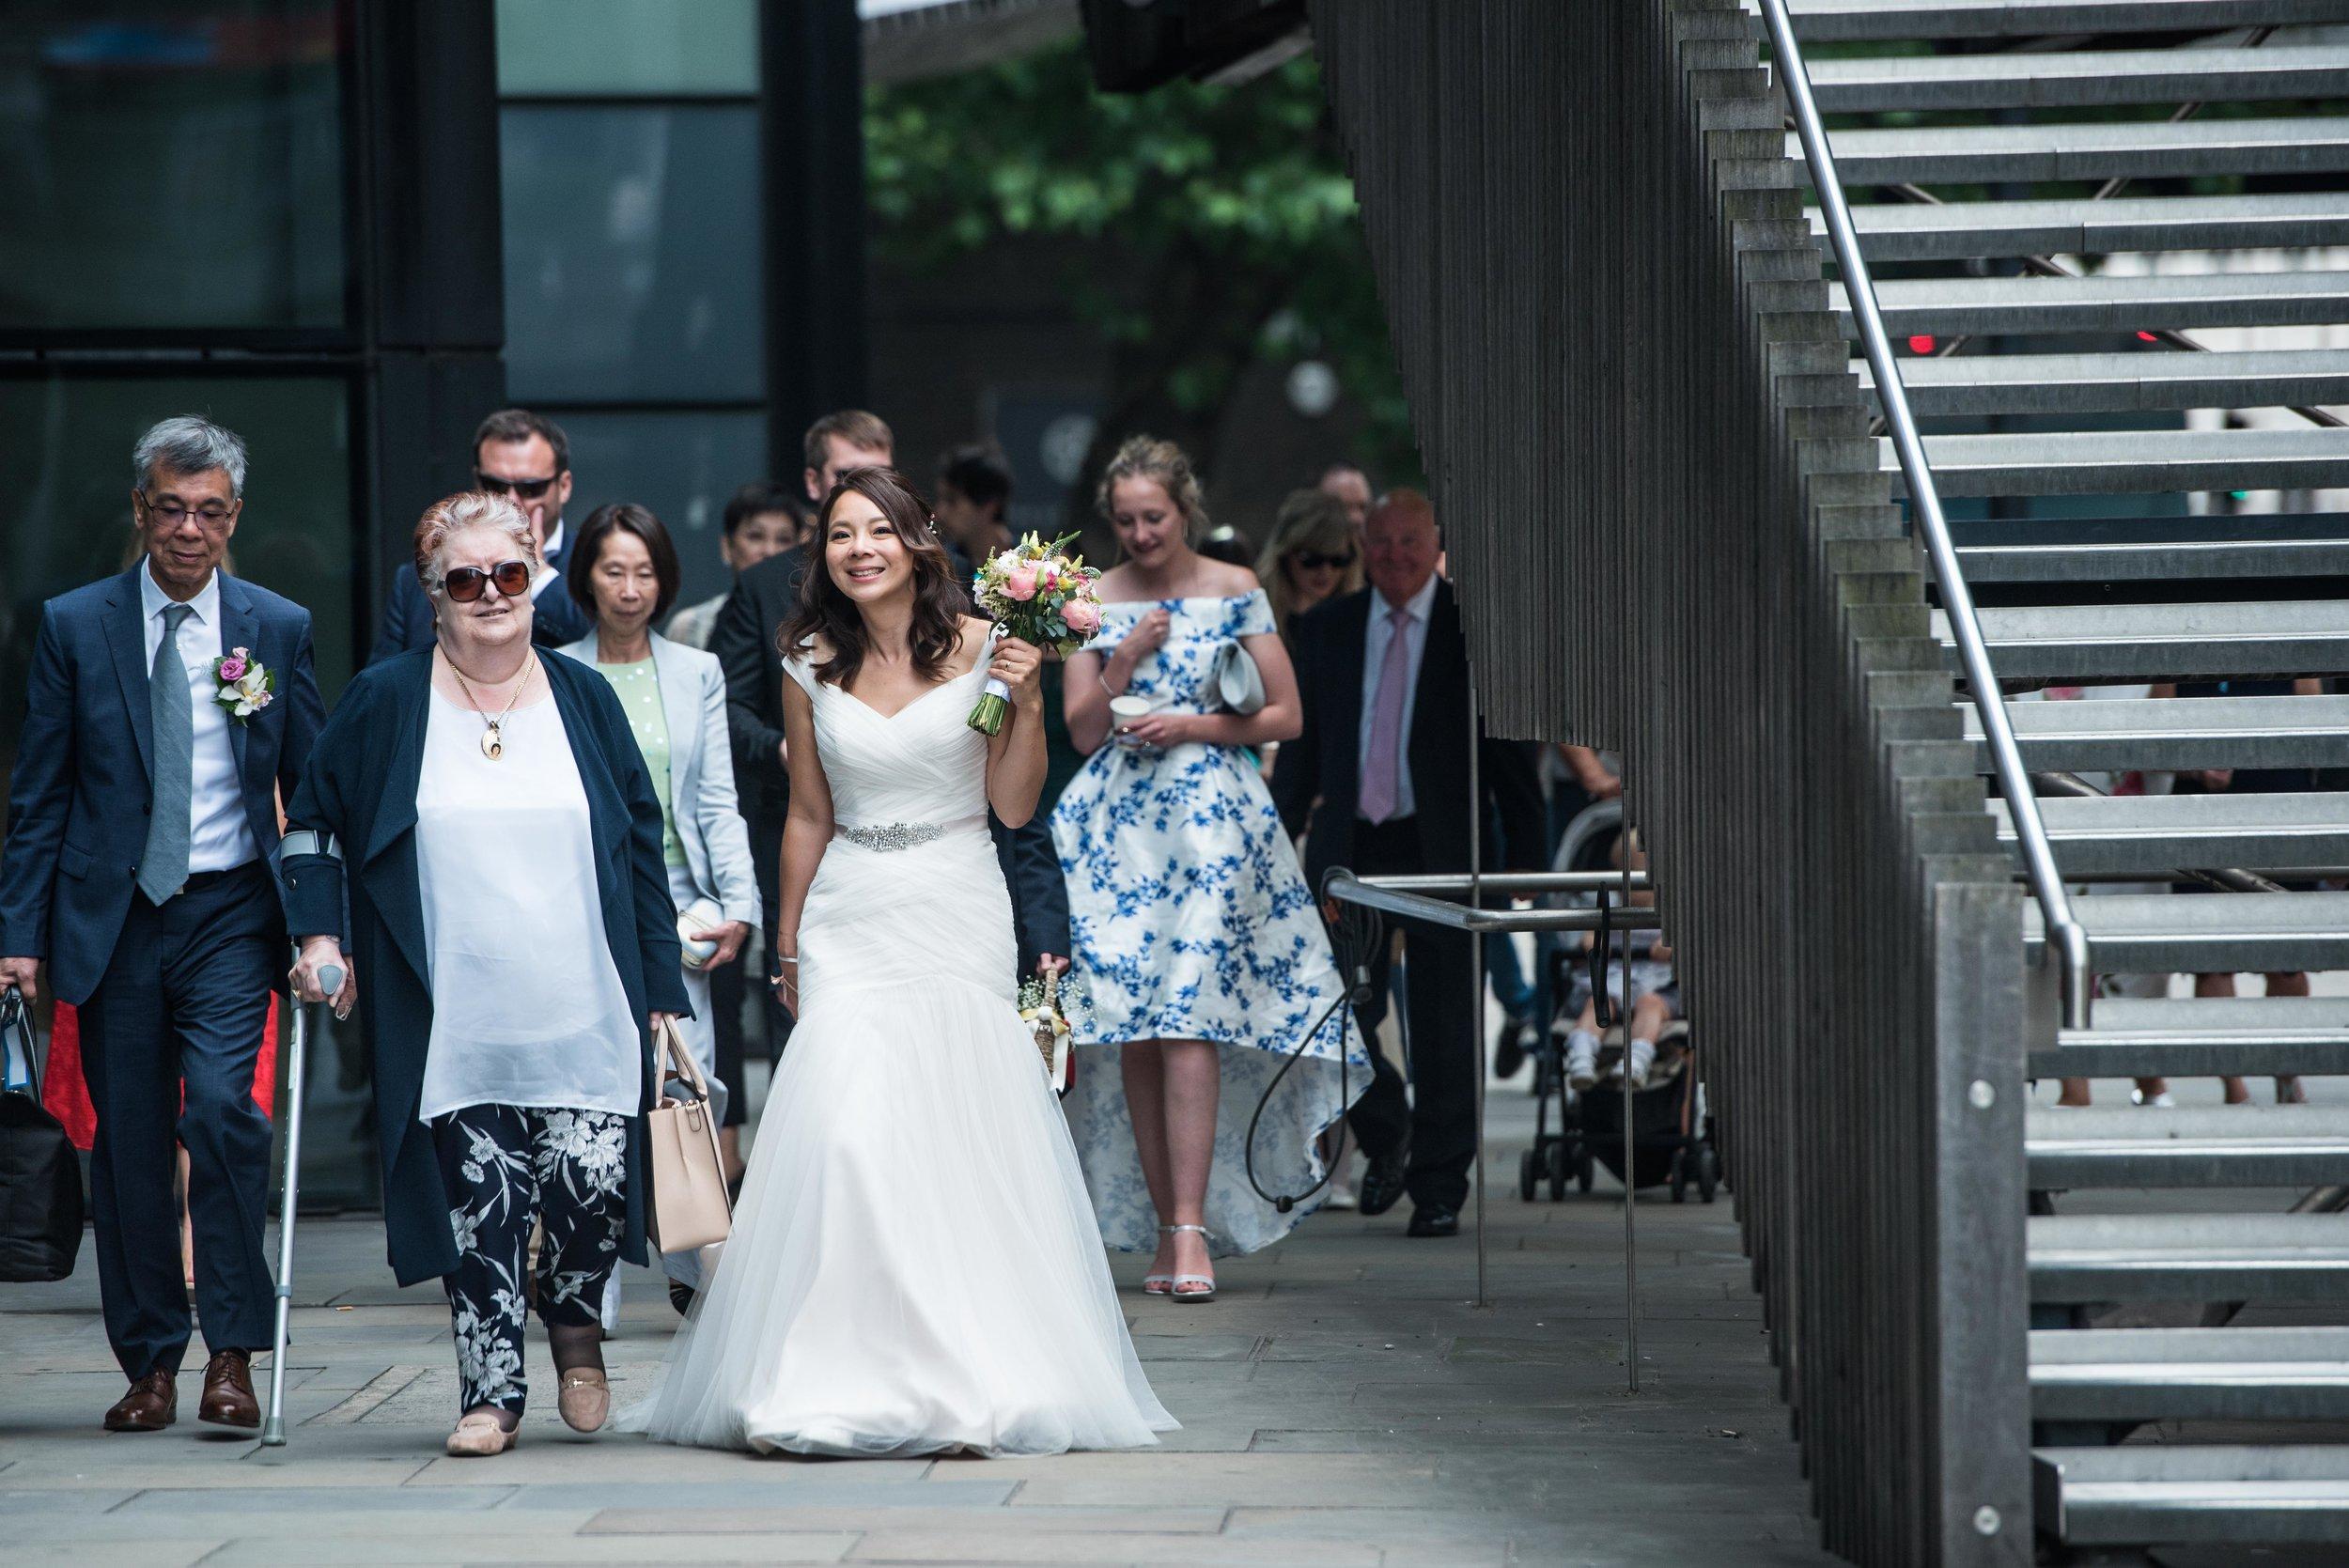 D&M_Marylebone Town Hall Wedding (196 of 239).jpg